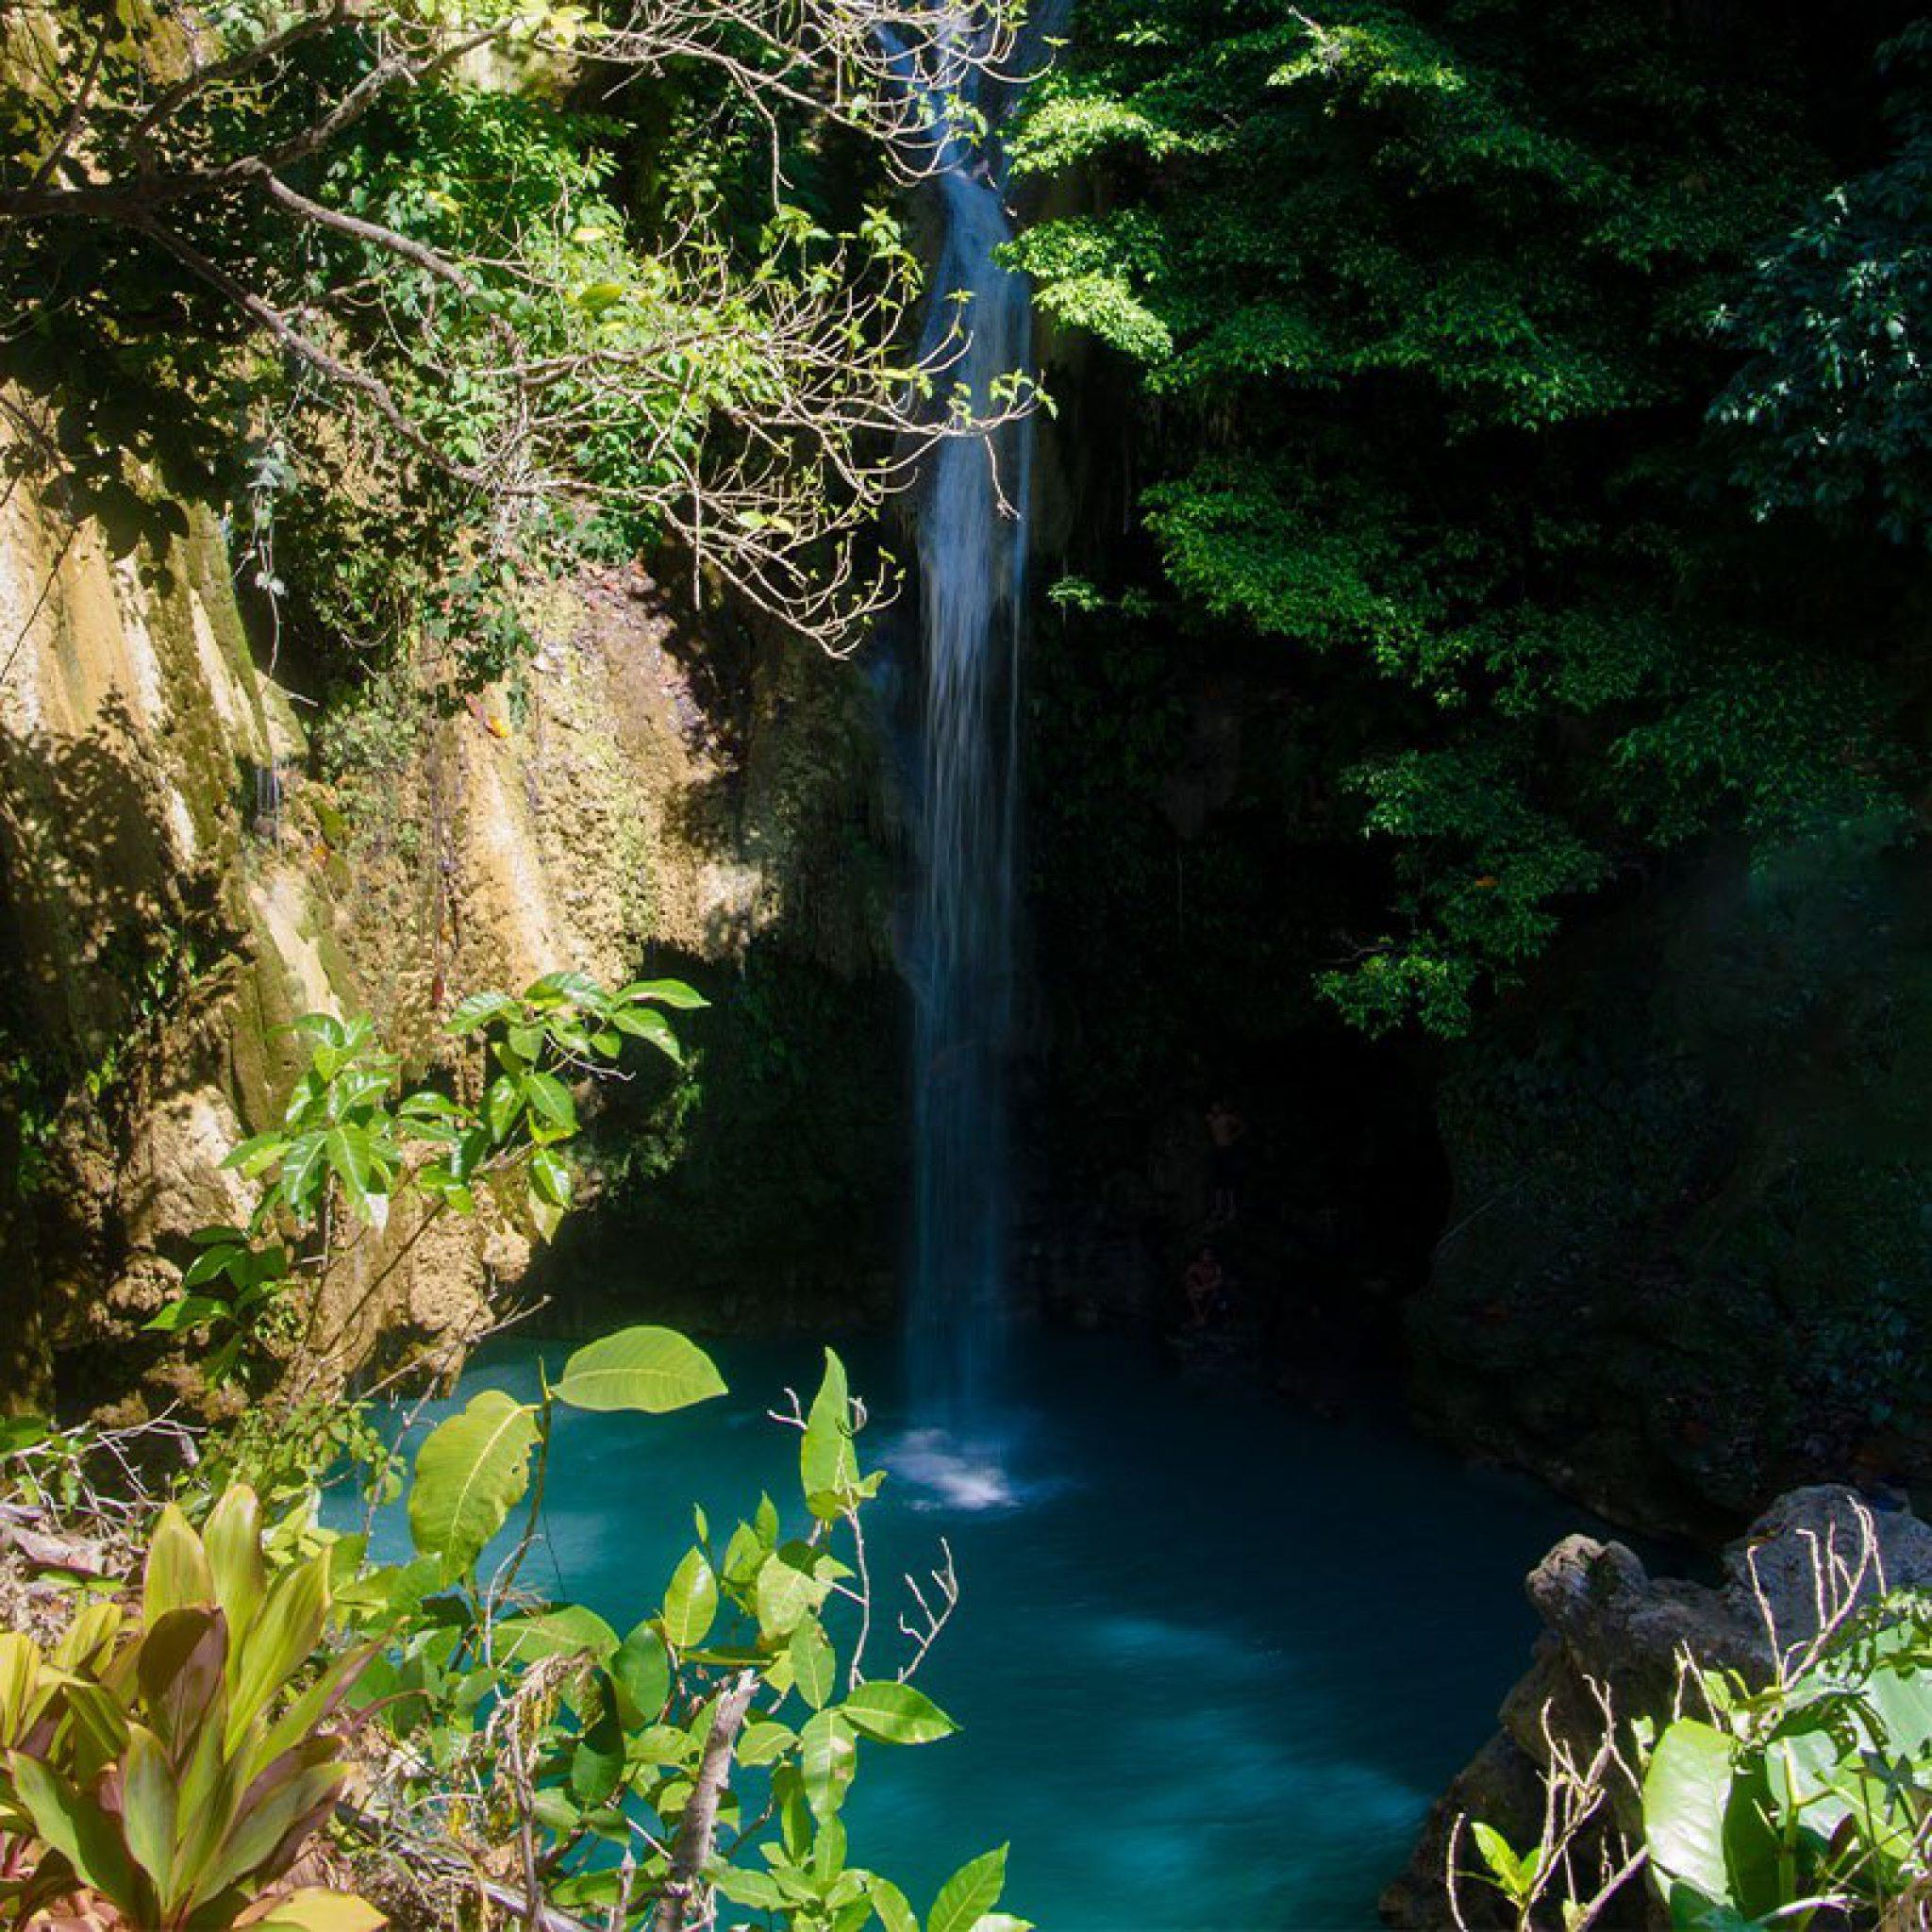 Negros Occidental Budget Travel Guide